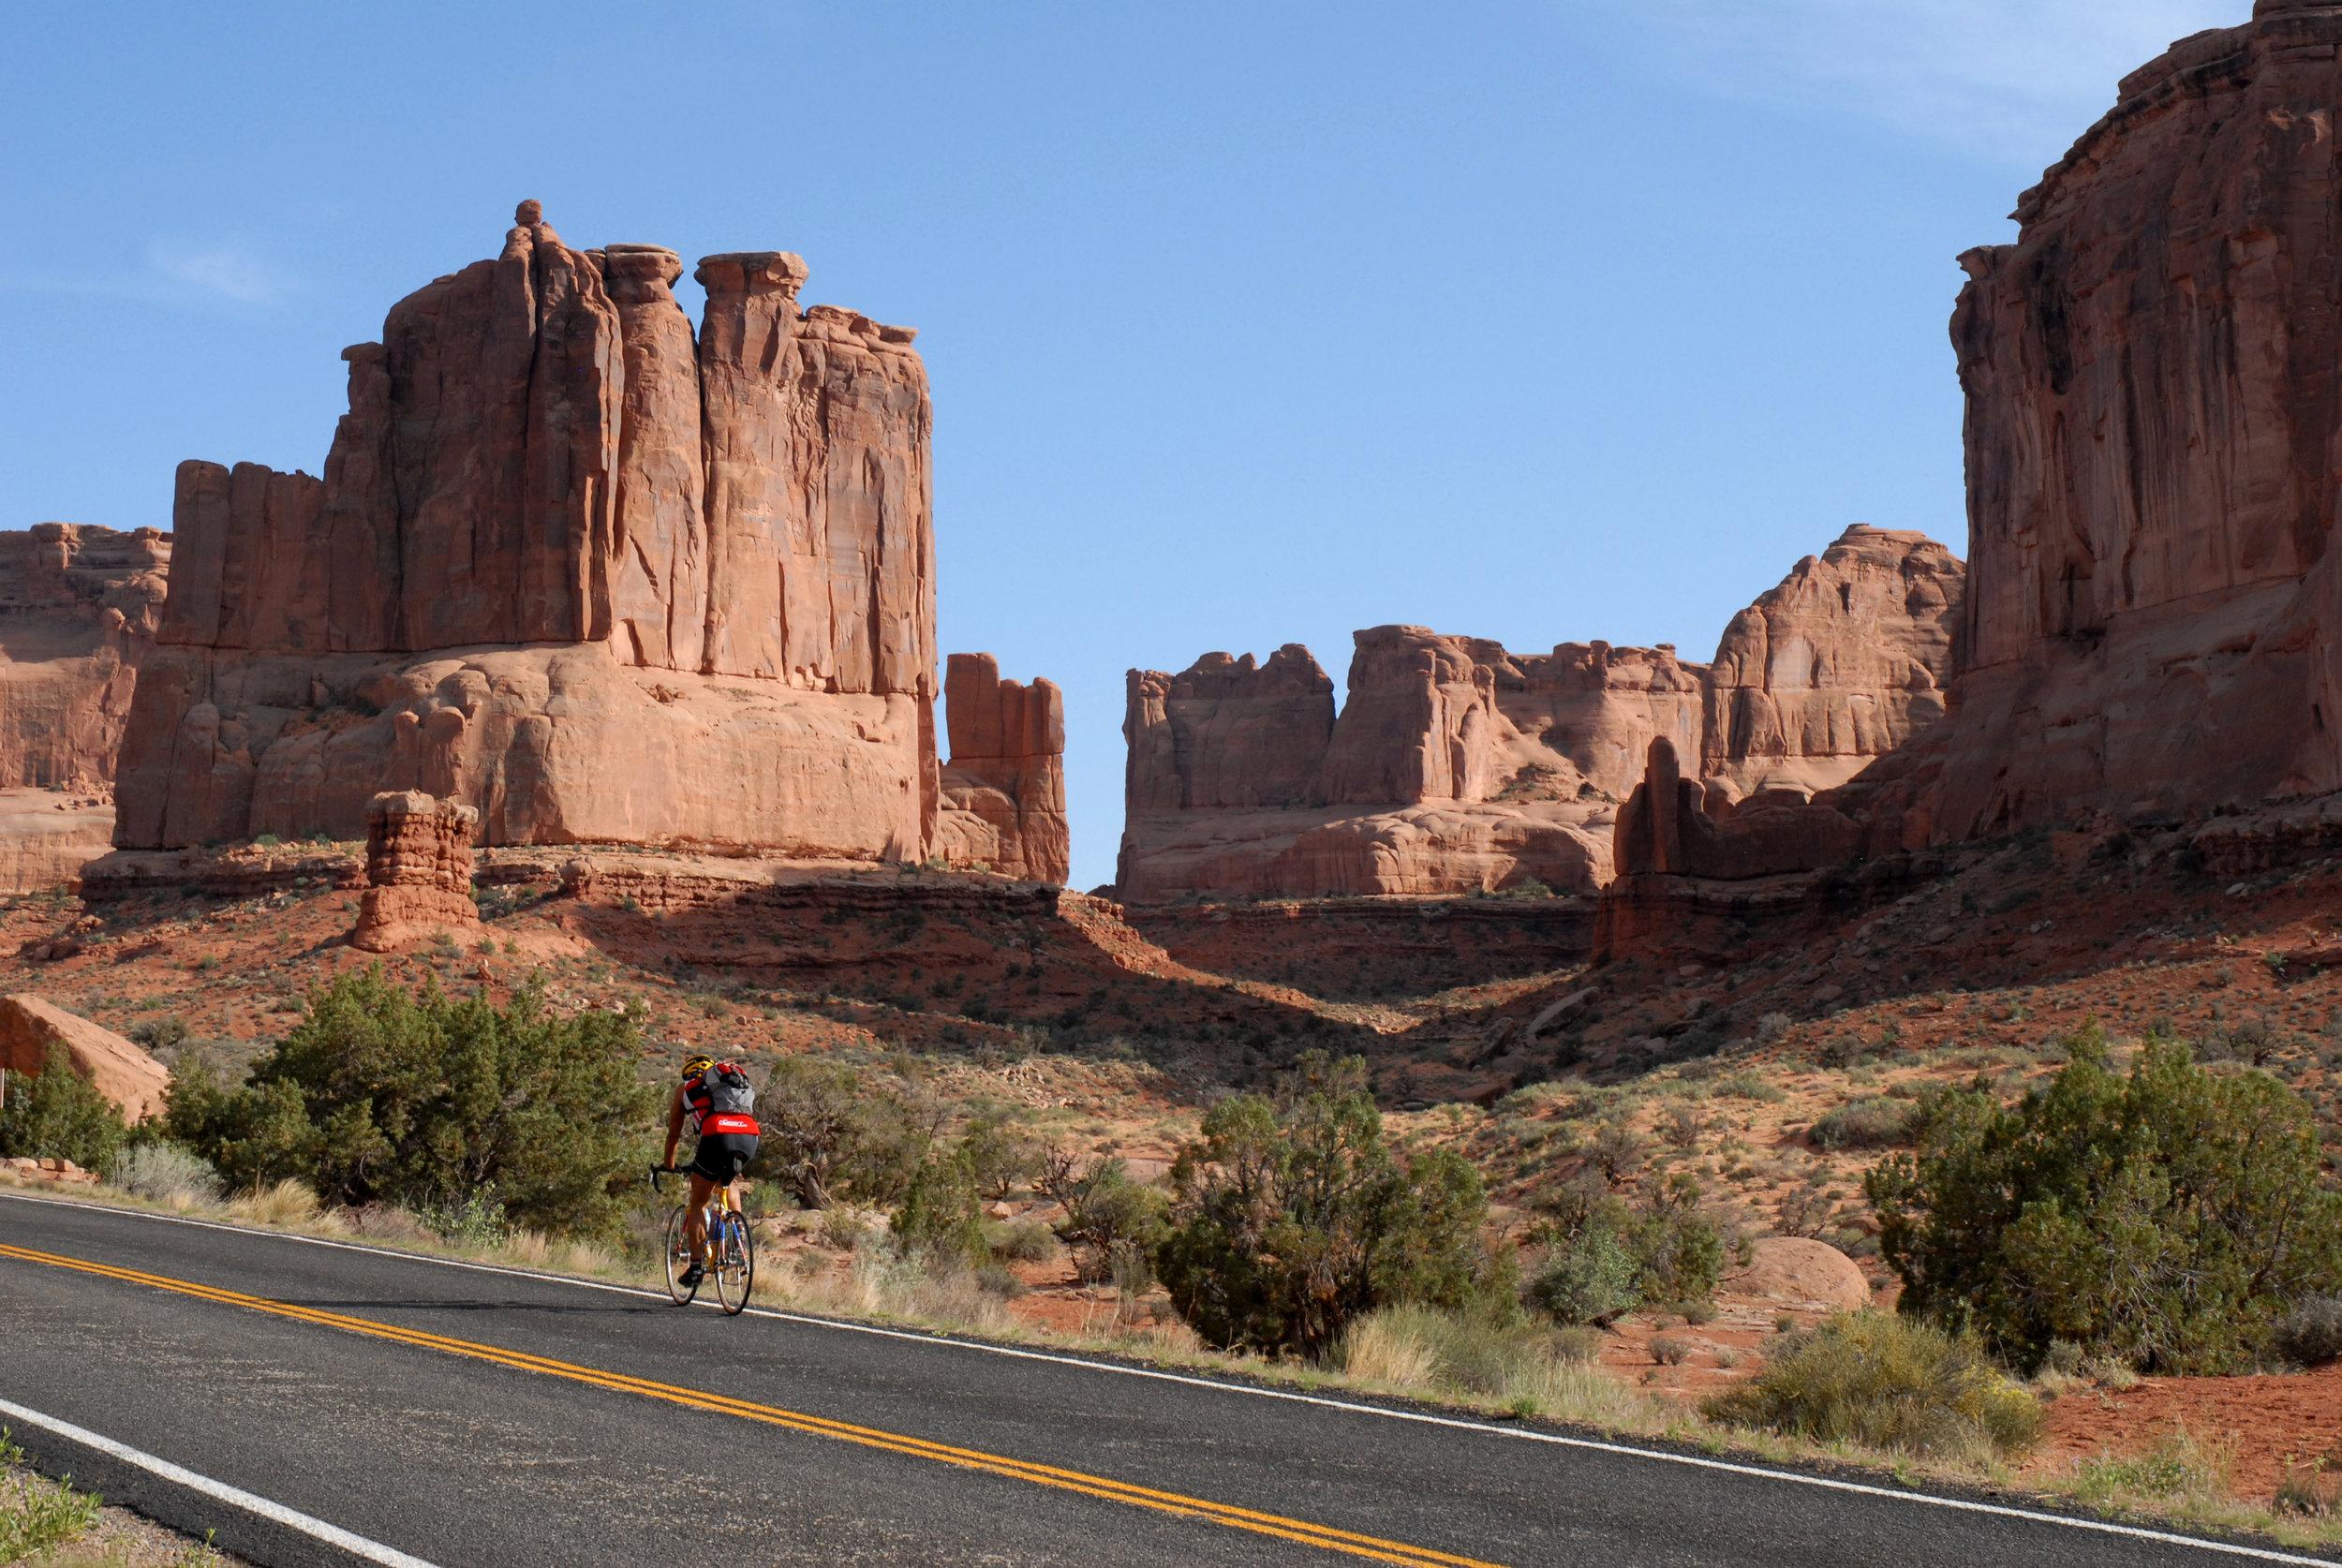 Biking at Arches National Park